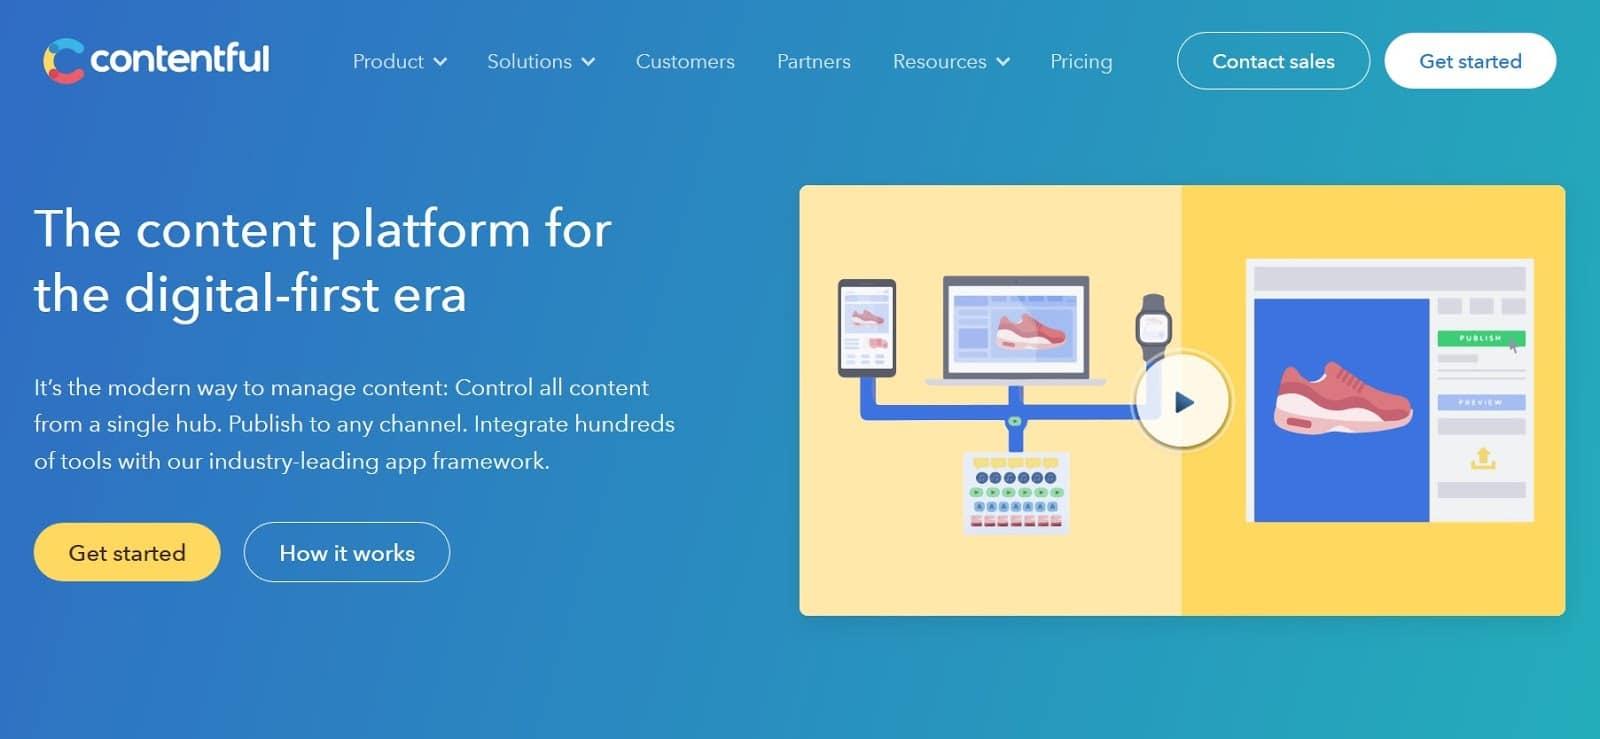 cms software 9 contentful